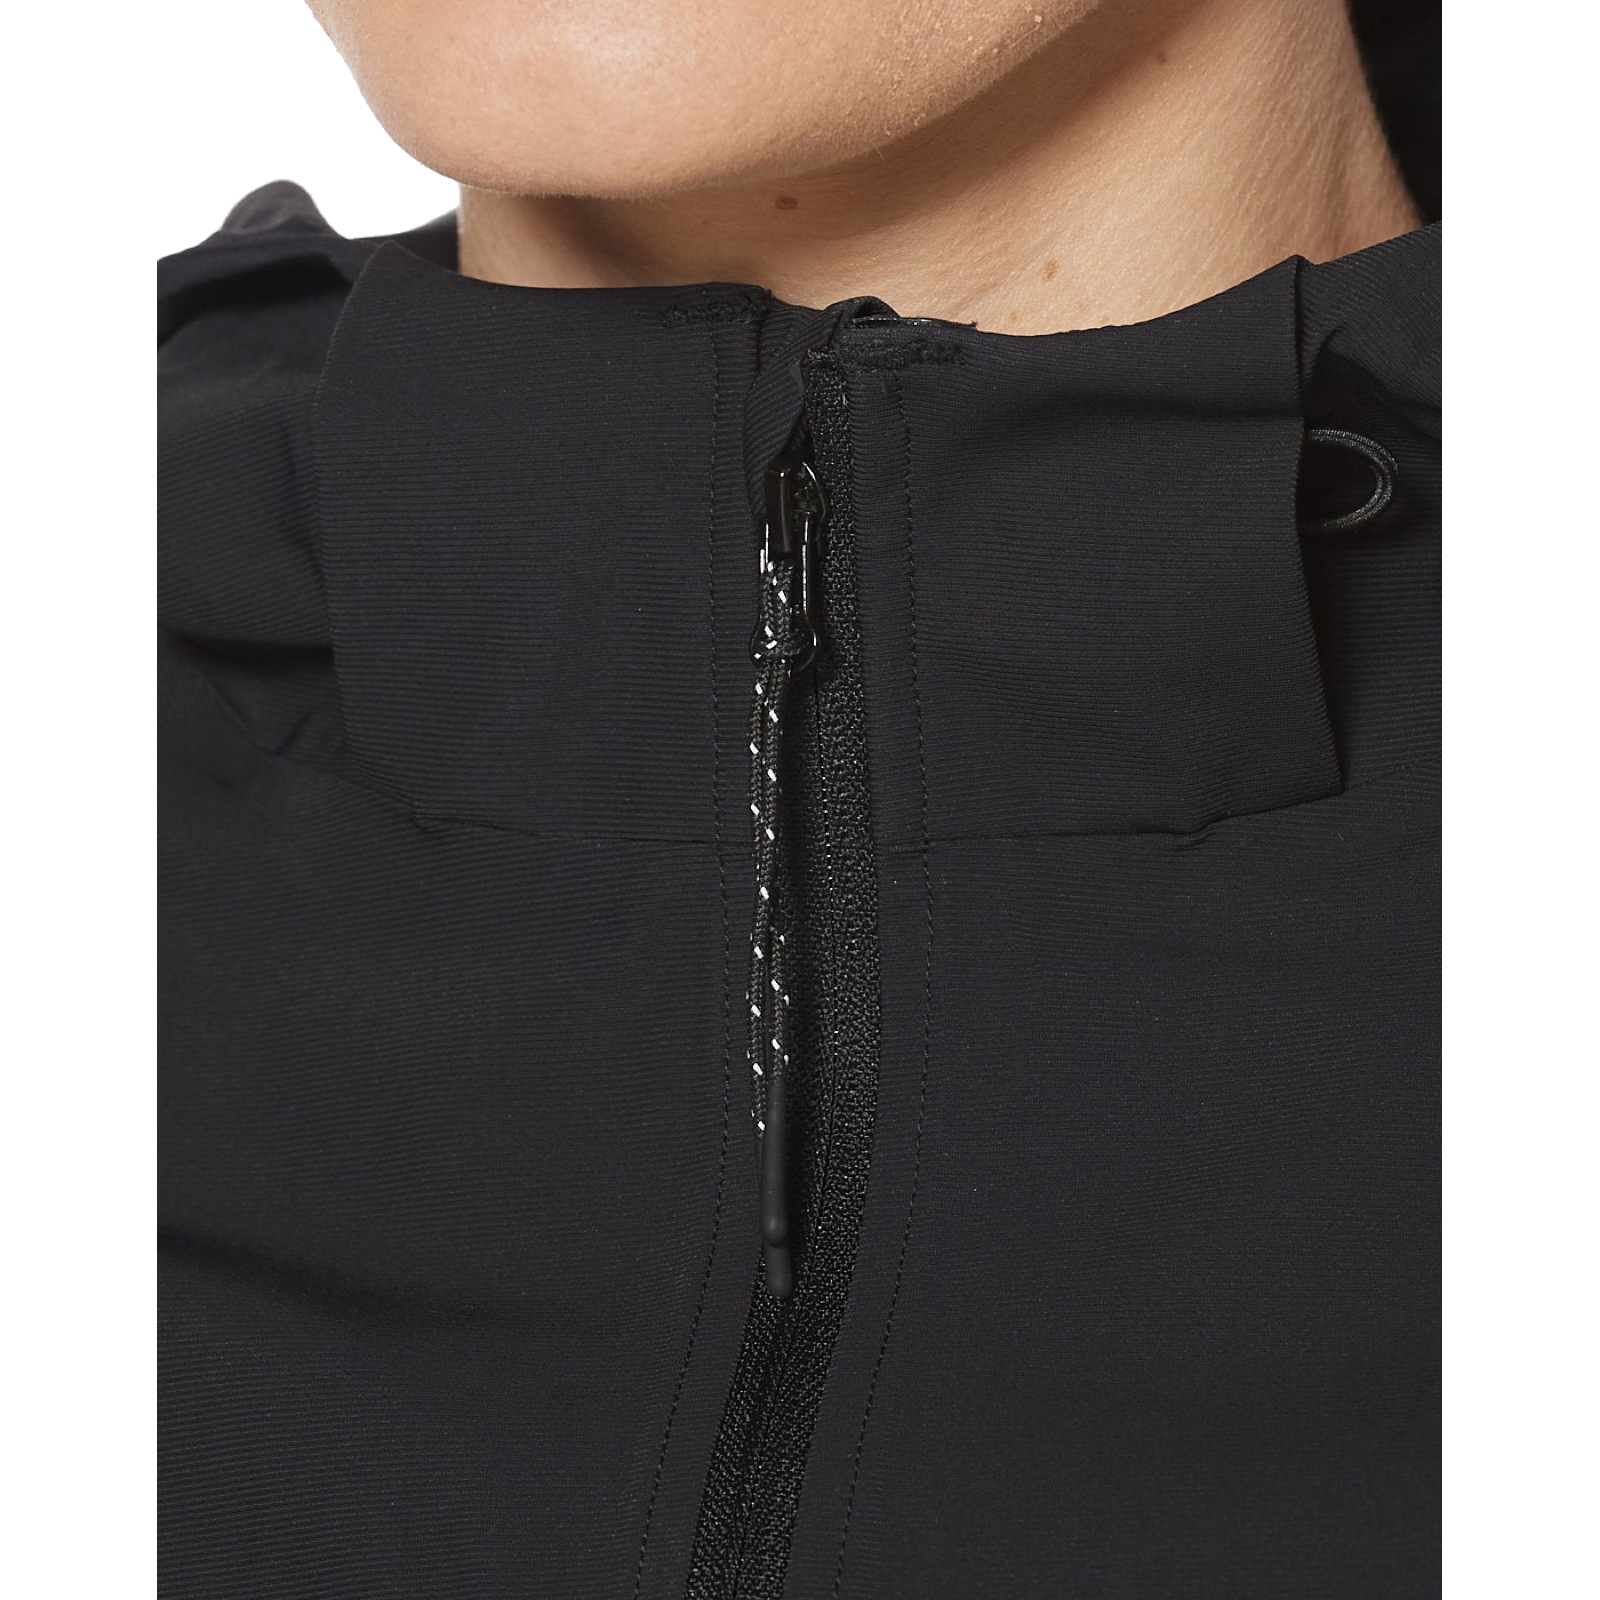 Imagen de 2XU GHST Waterproof Chaqueta para mujeres - black/gold reflective